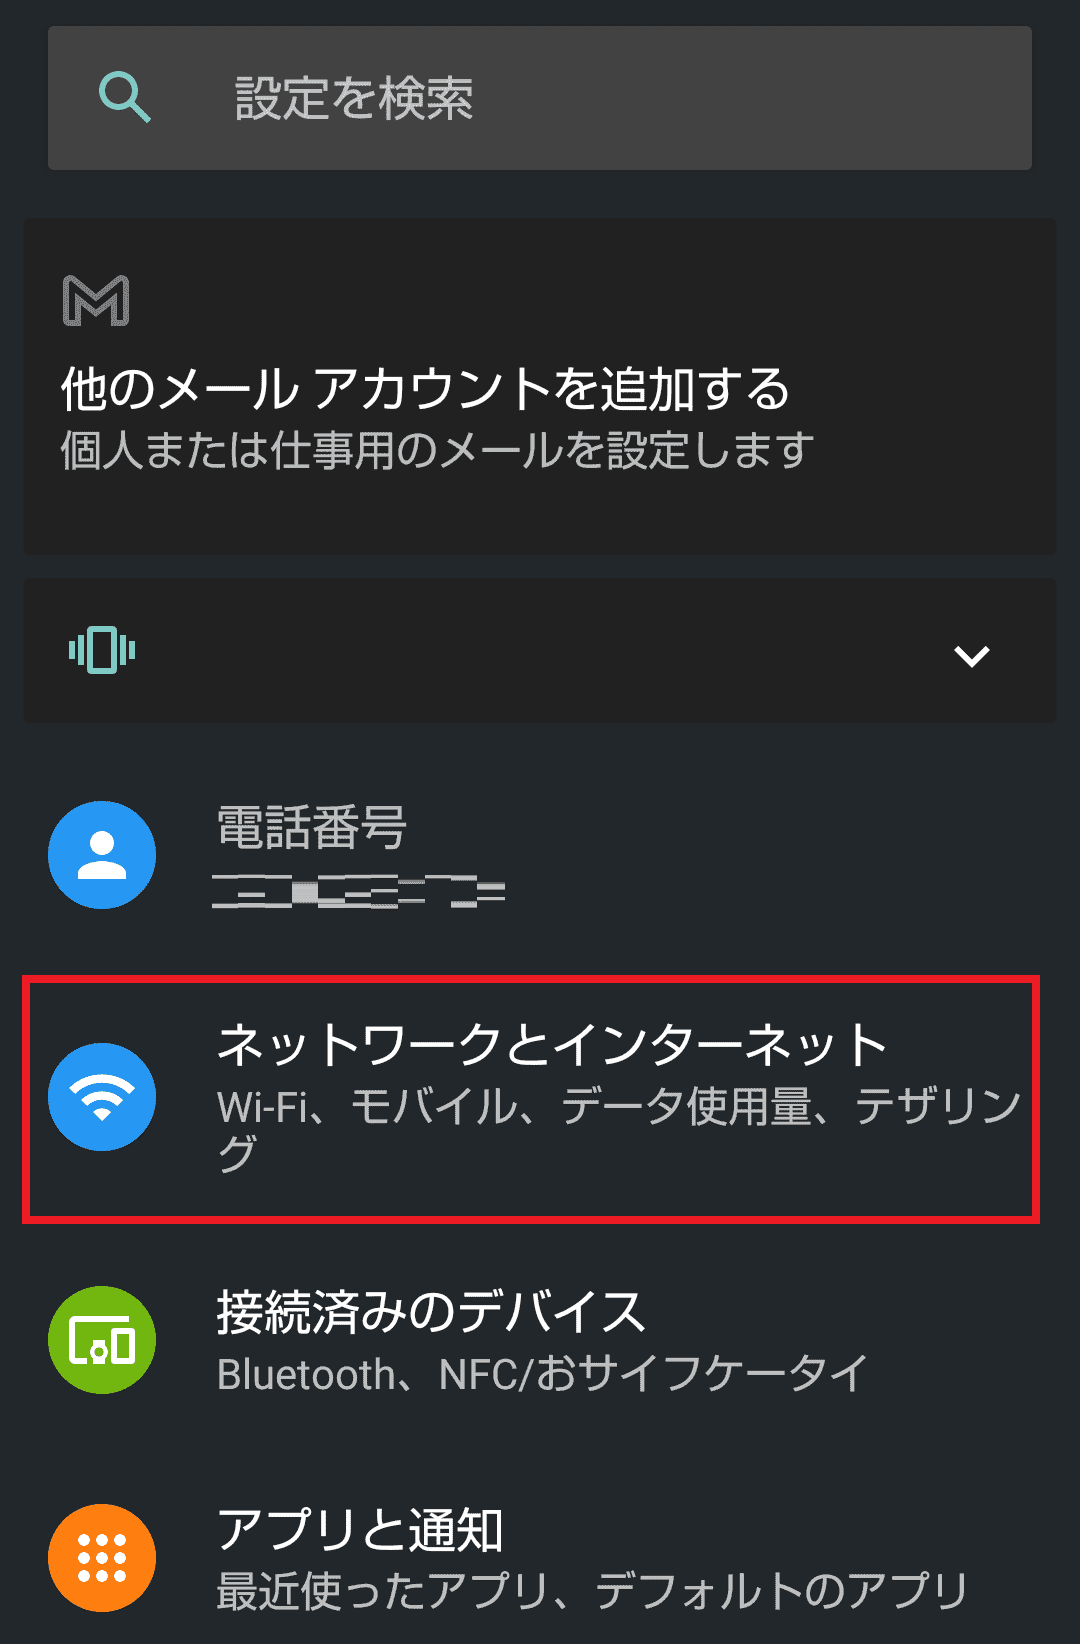 1GBの設定方法